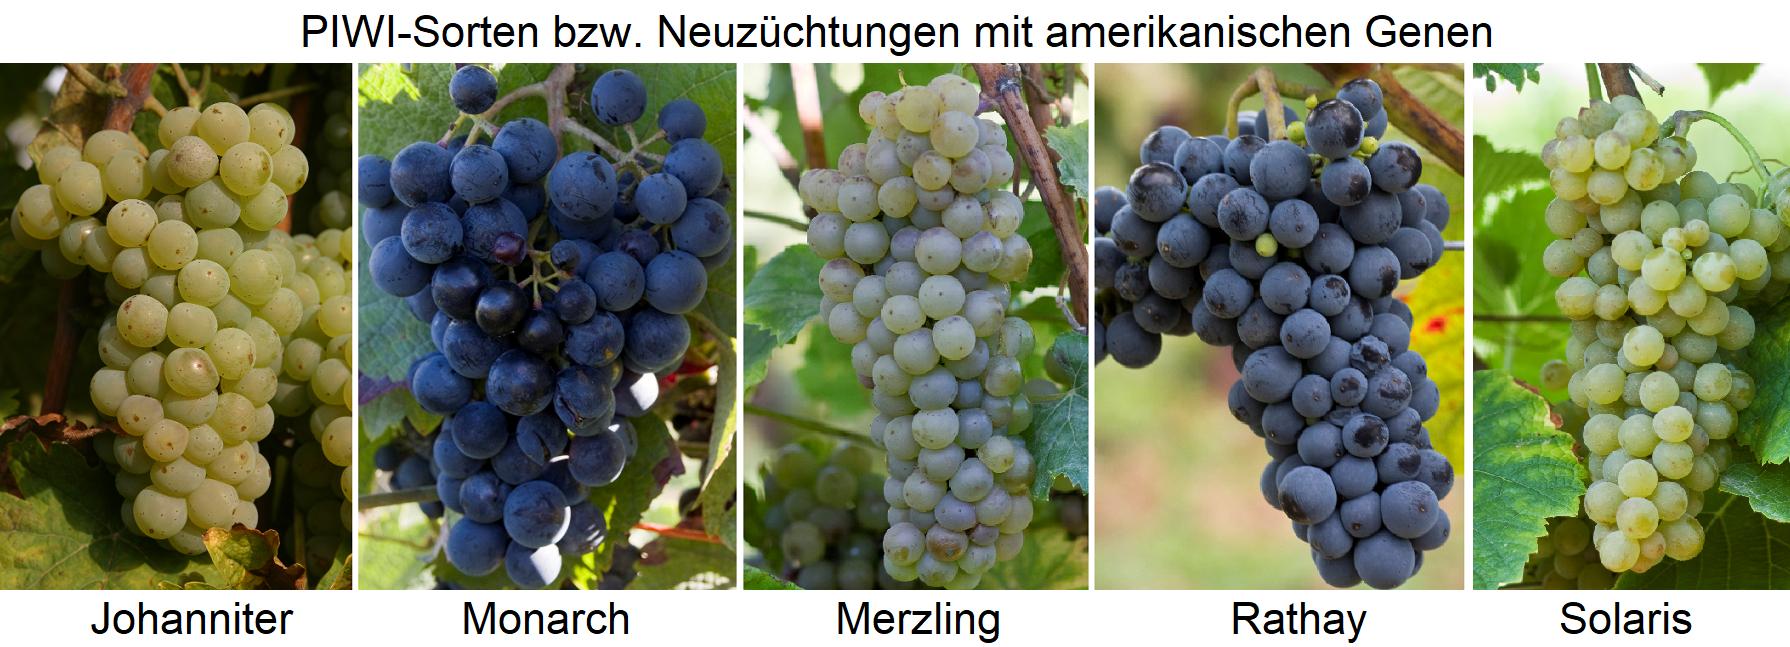 PIWI varieties - Johanniter, Monarch, Merzling, Rathay, Solaris